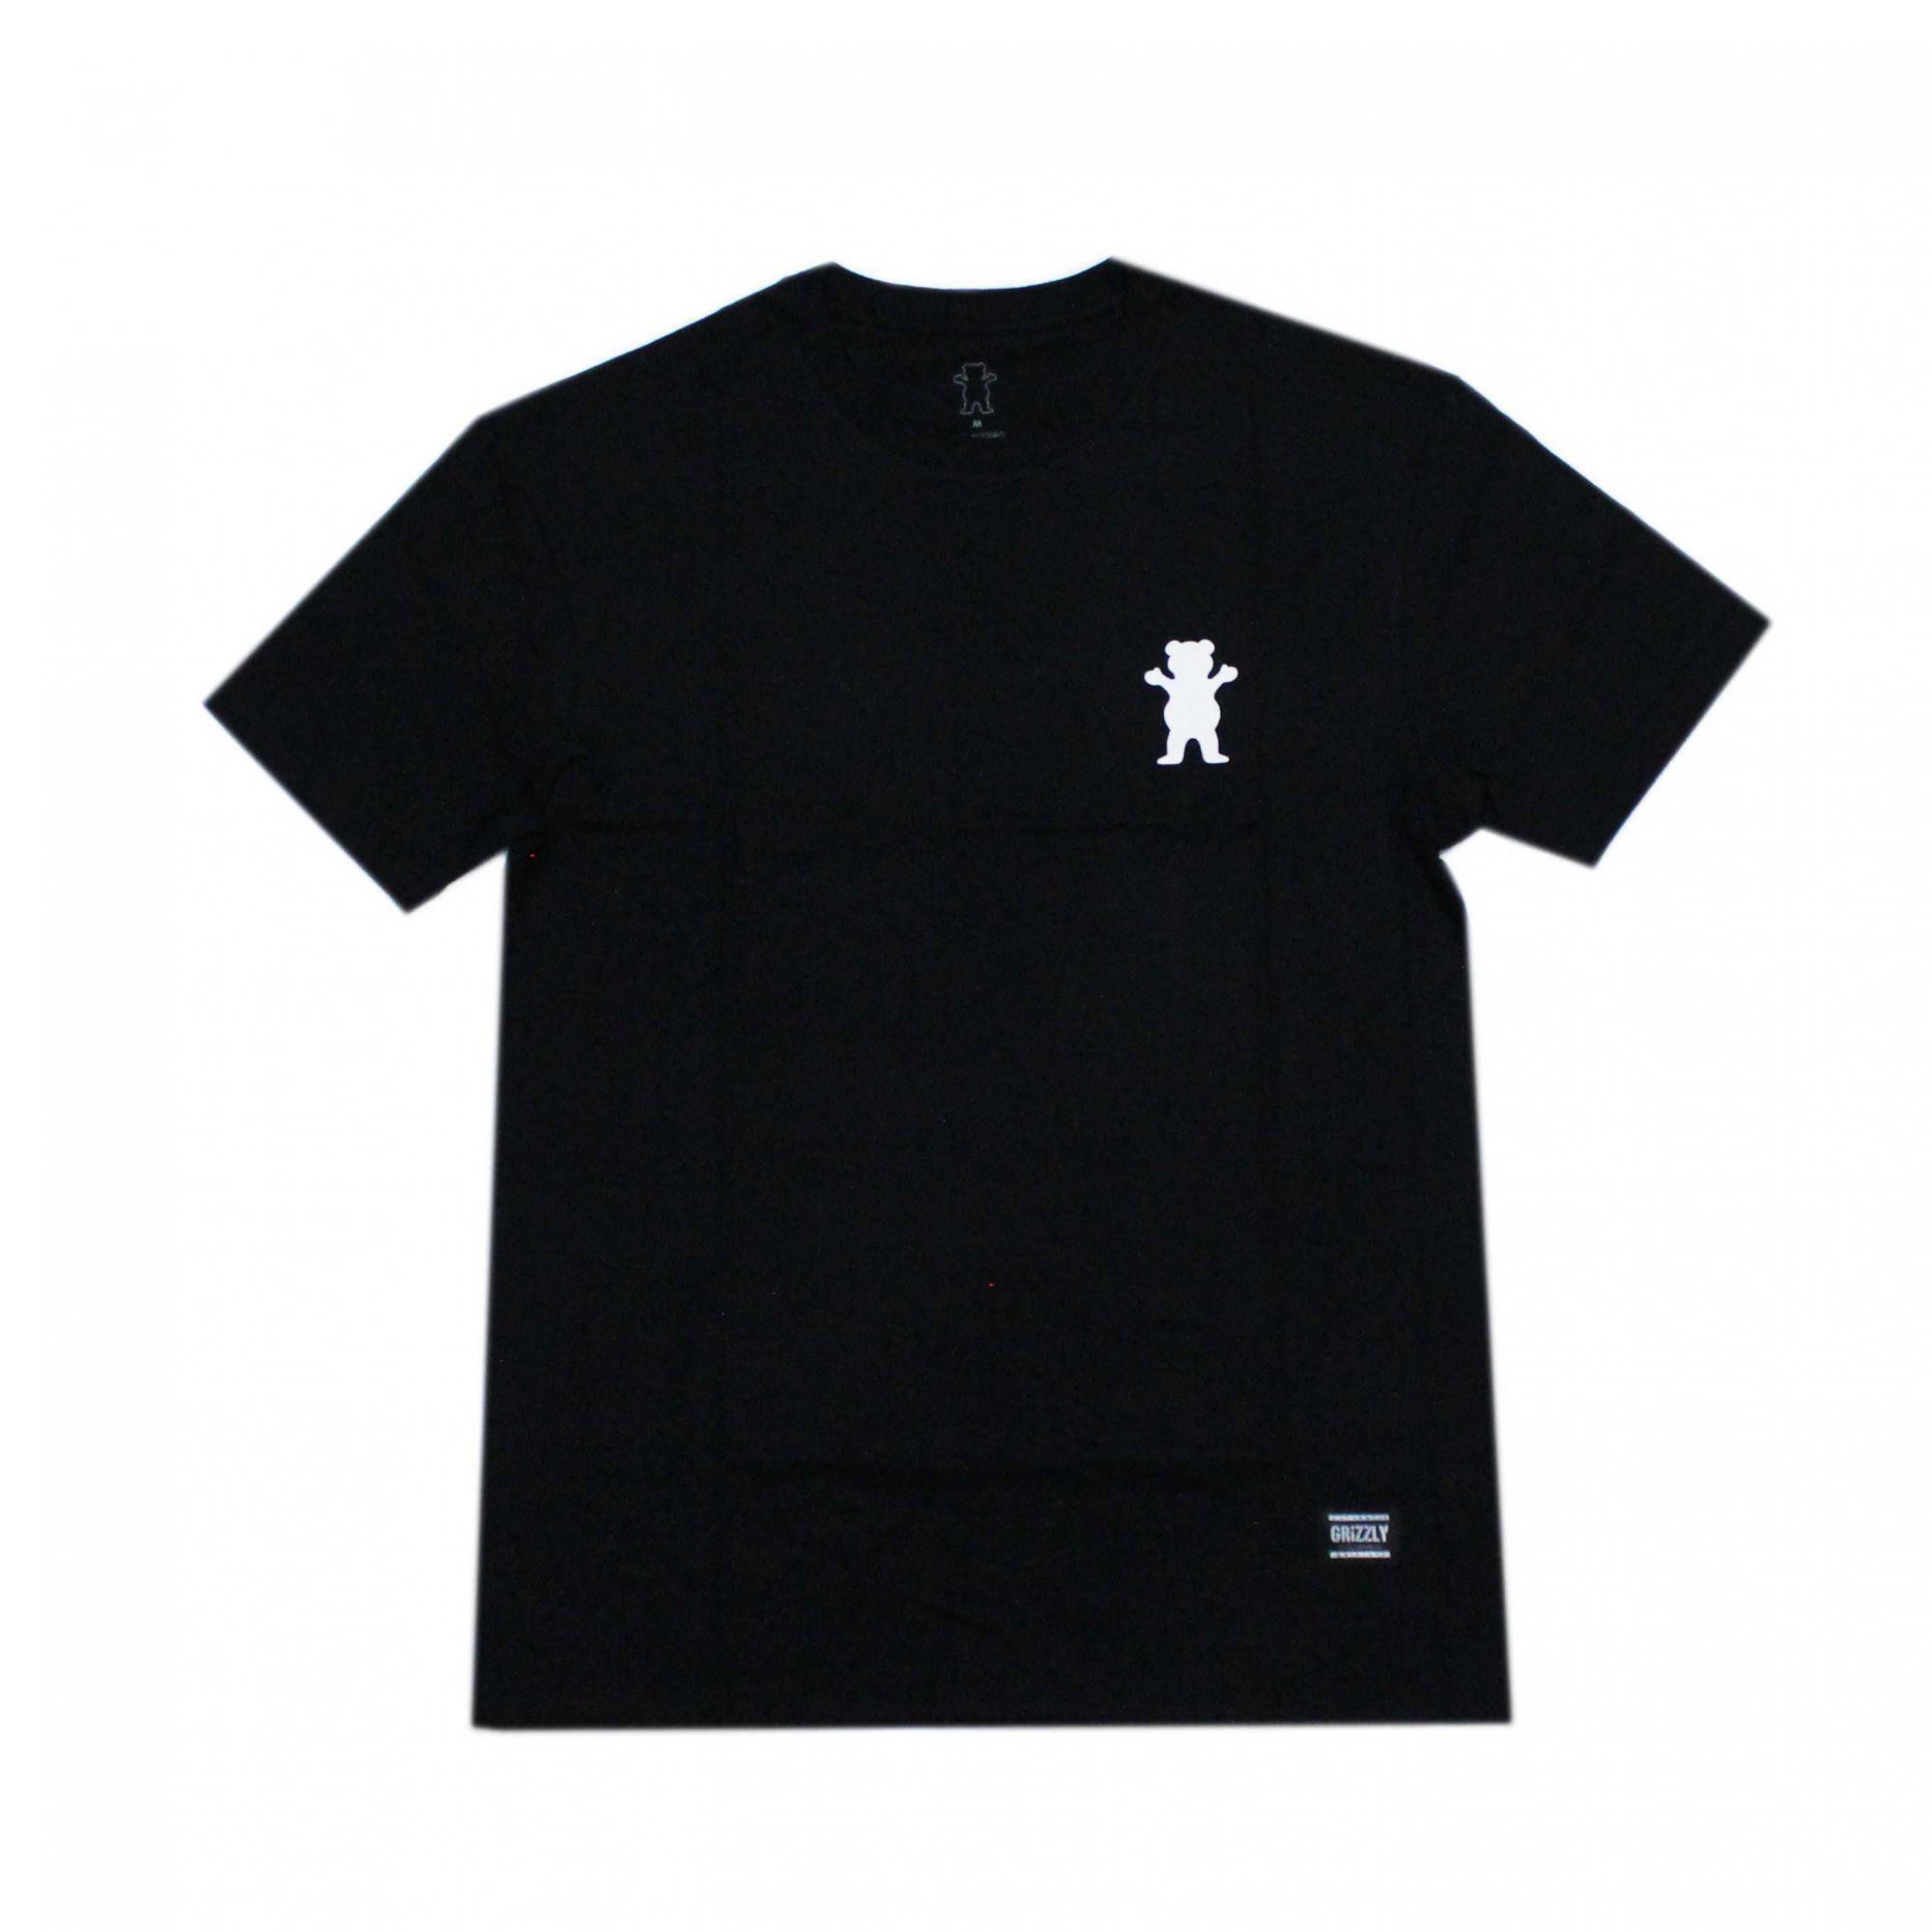 Camiseta Grizzly Stampback Preto